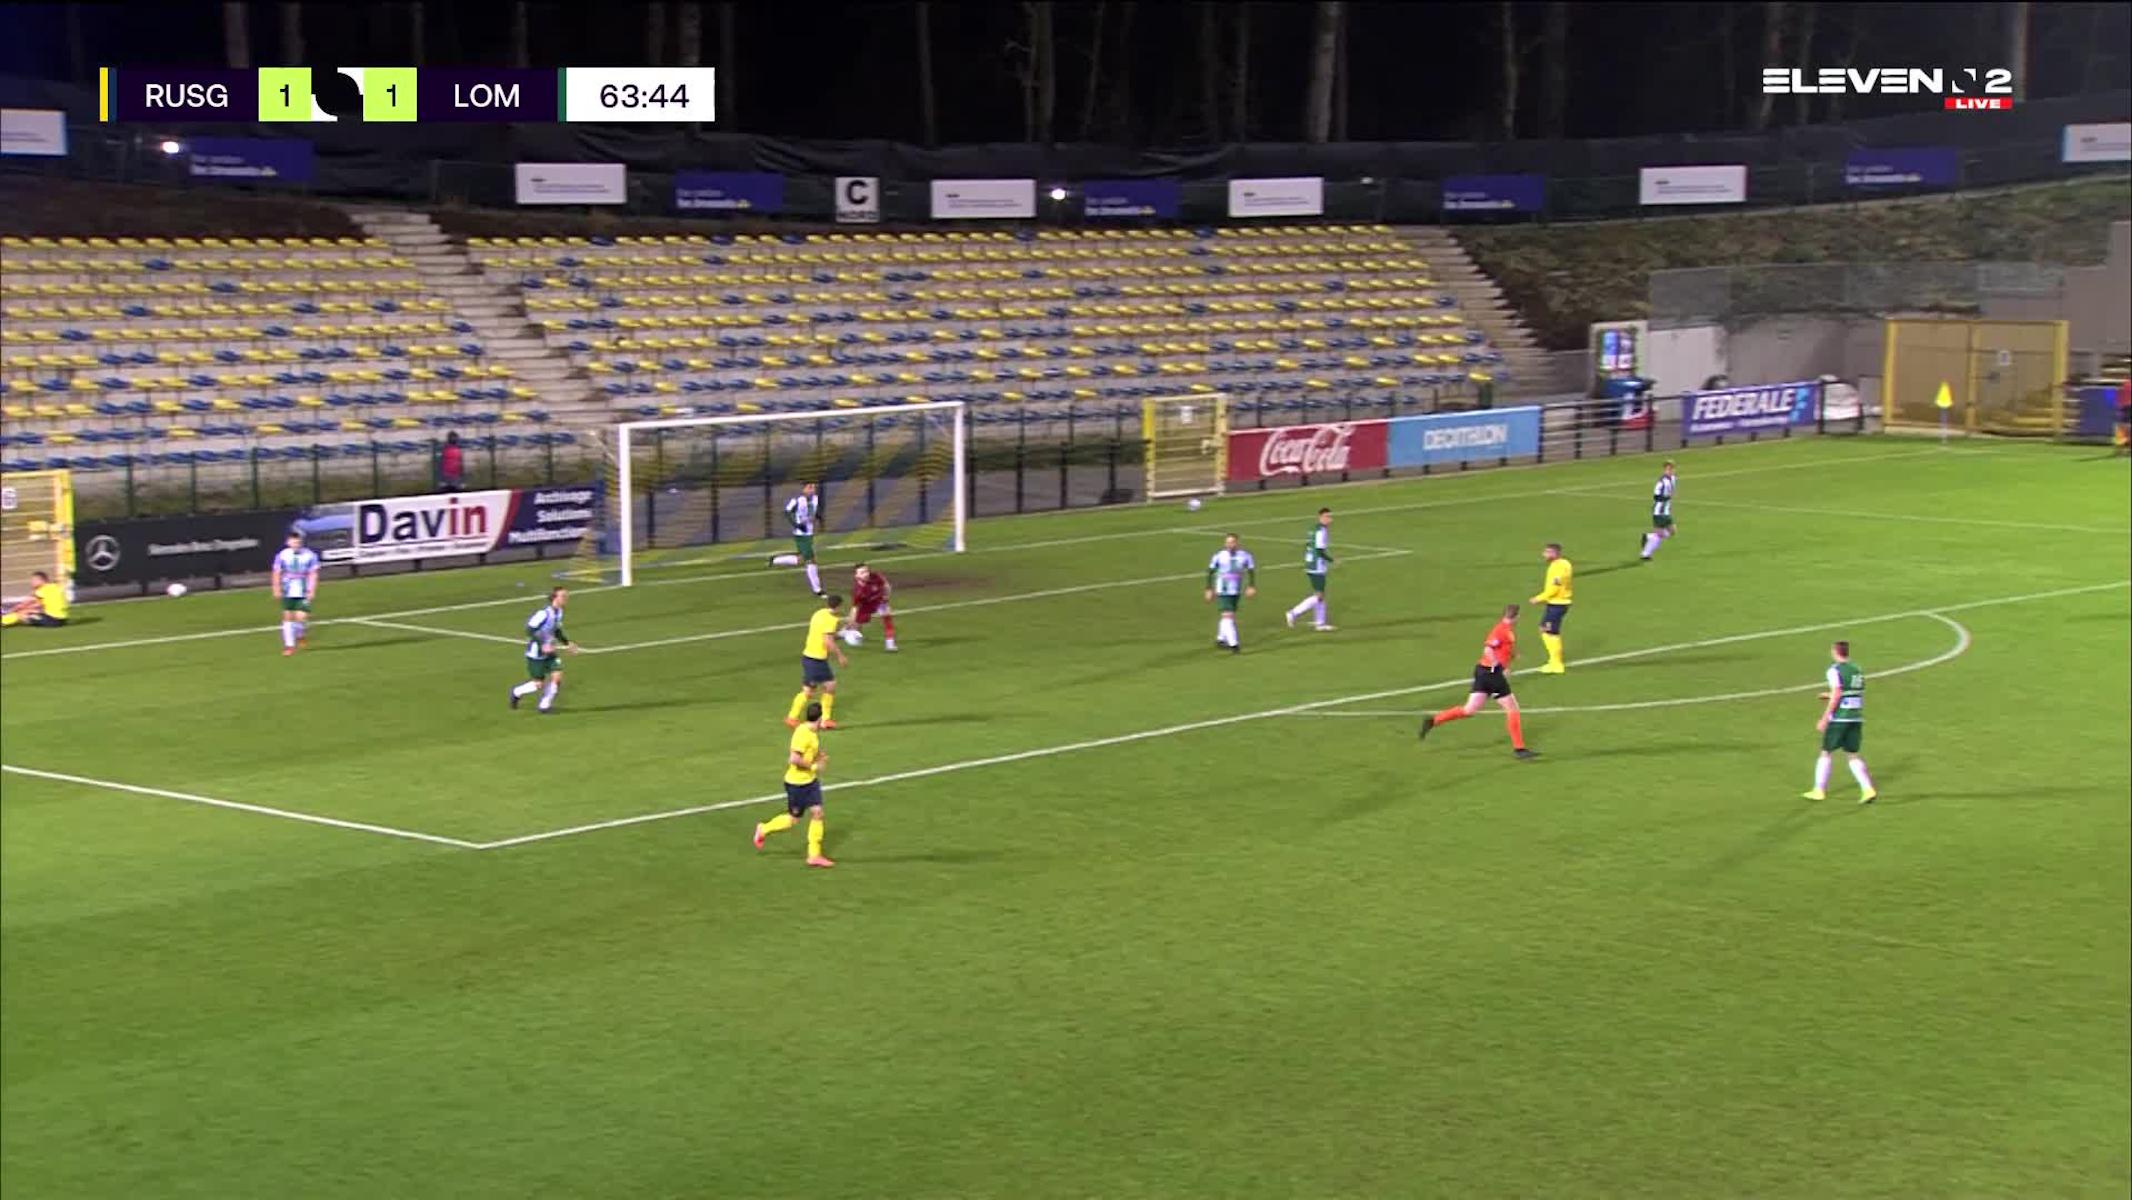 But Marlos Moreno (Royale Union Saint-Gilloise vs. Lommel SK)